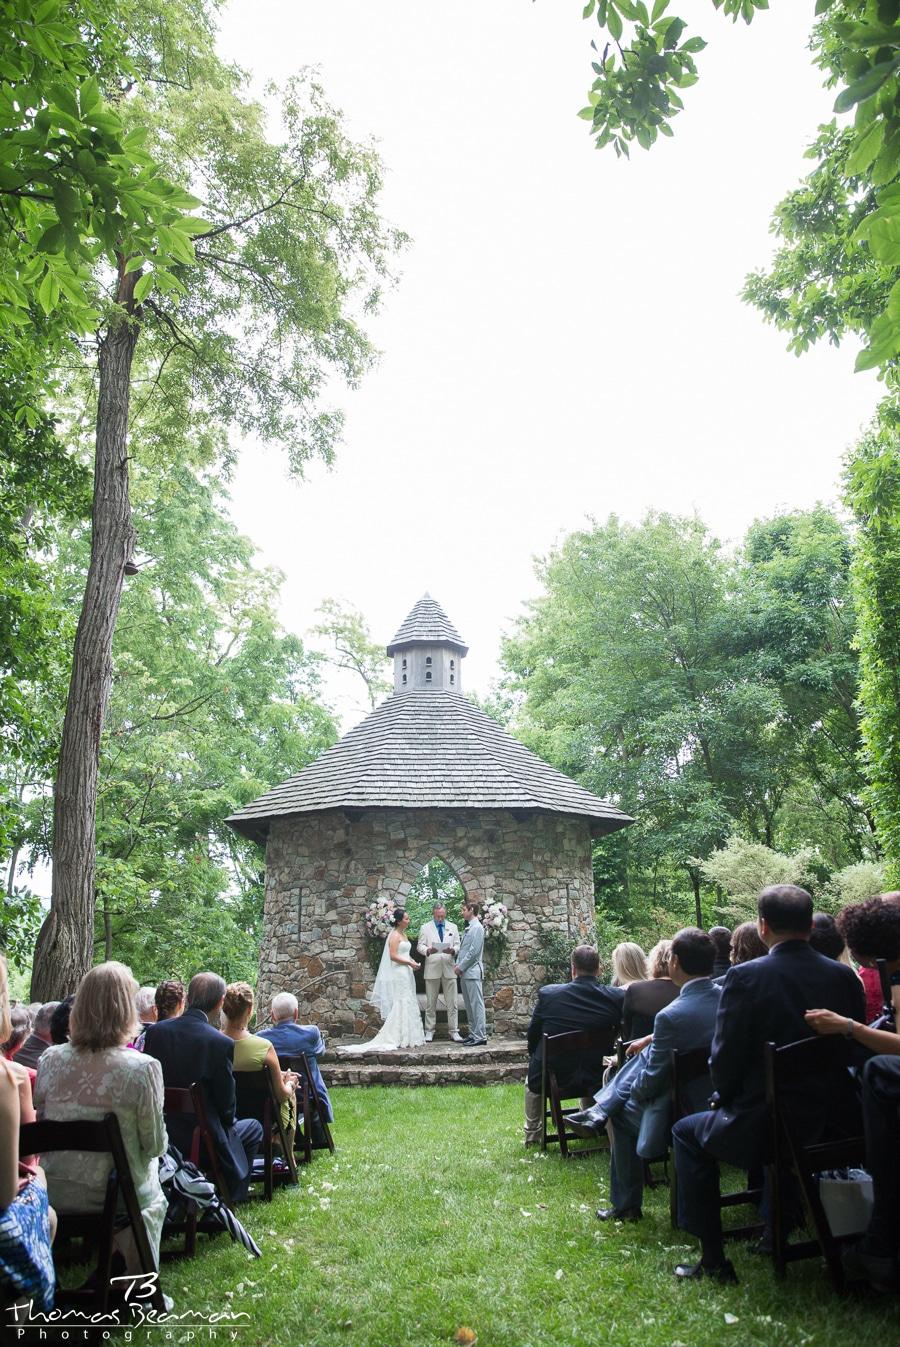 Thomas_beaman_wedding_best_of_2015_photo-31